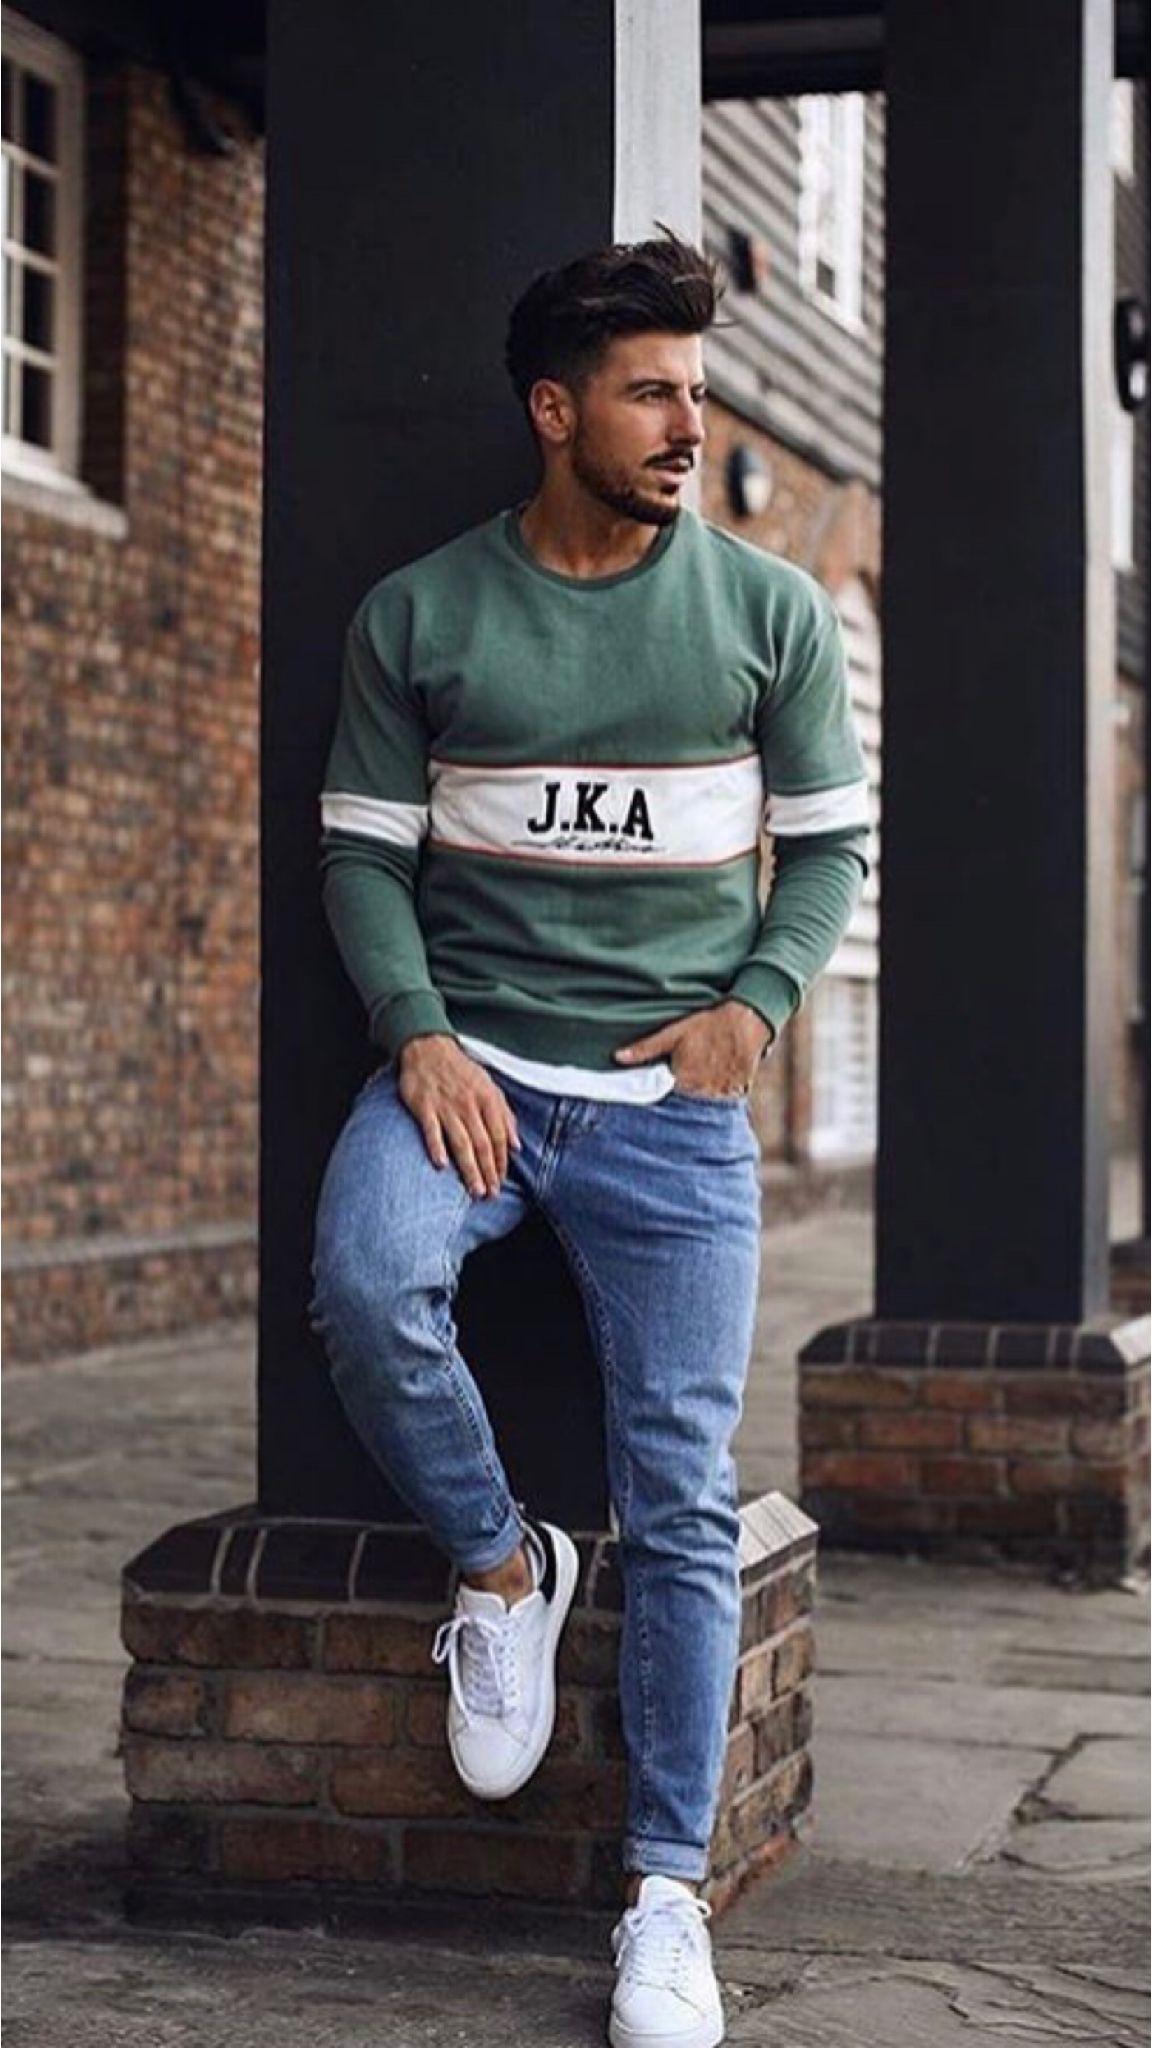 18 Cool ways to wear sweatshirts! | Men fashion casual outfits, Mens fashion  streetwear, Stylish mens outfits